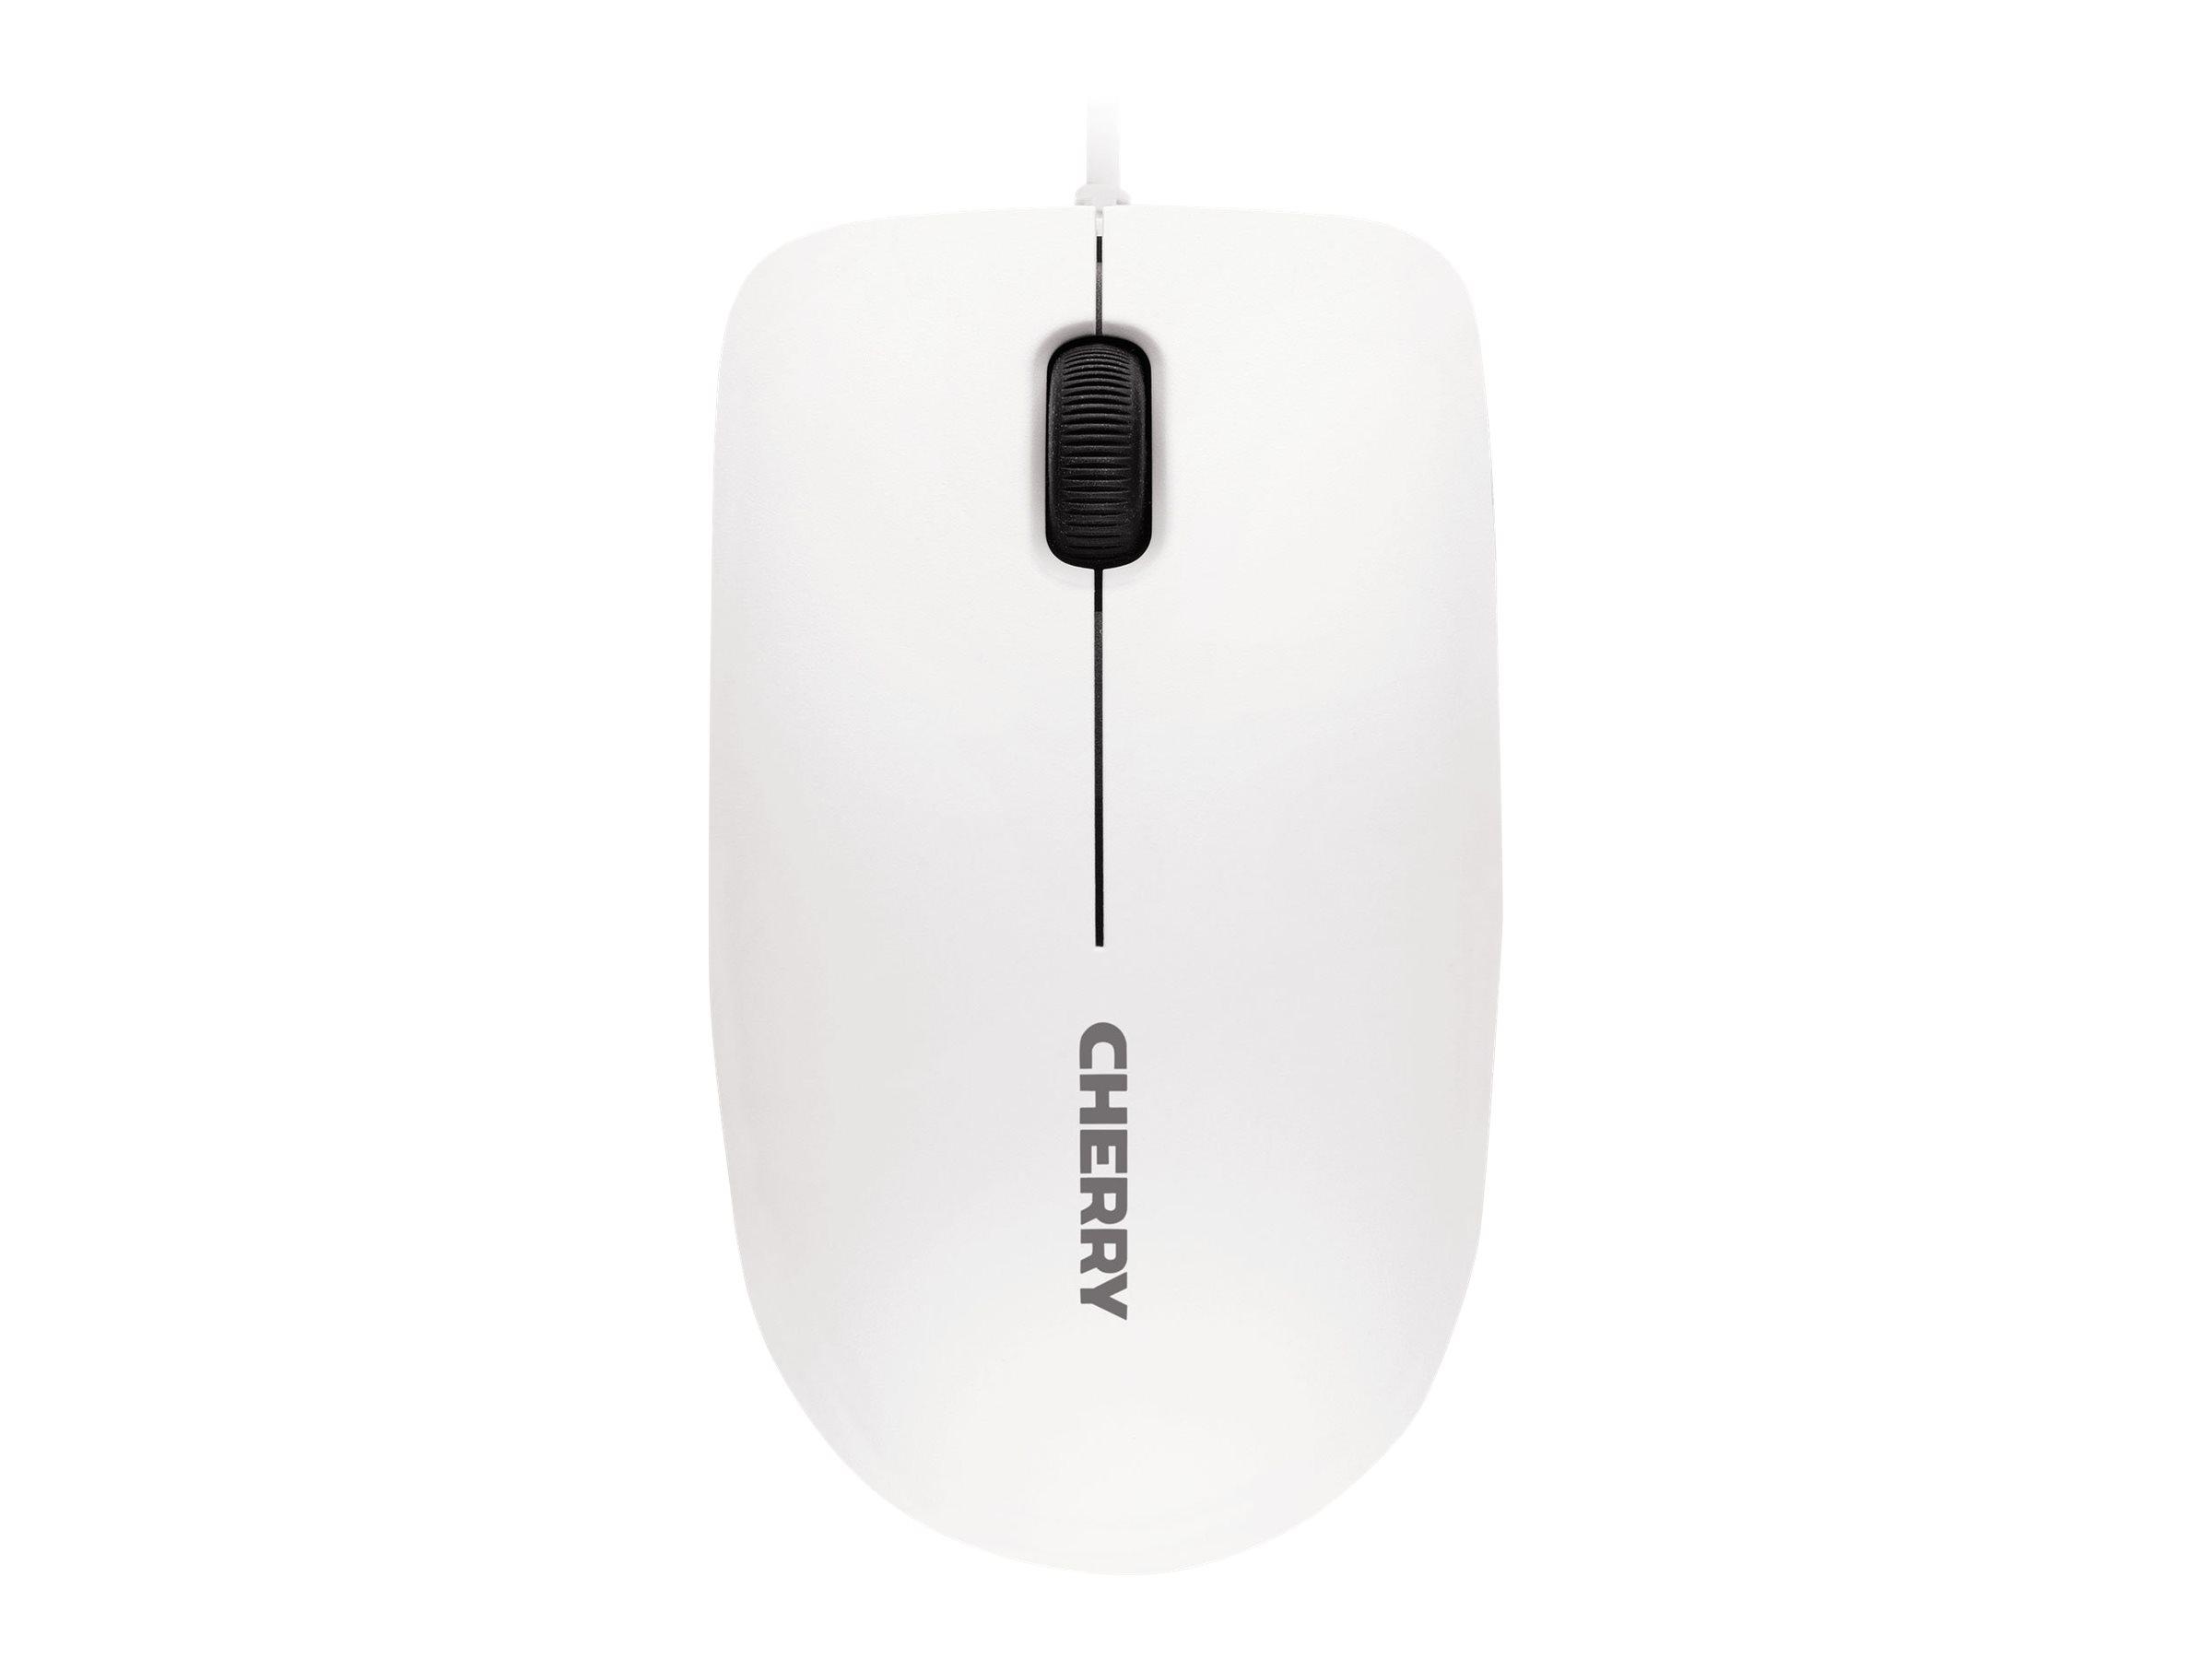 CHERRY Computer Maus - Modell:  CHERRY MC 1000 Weiß